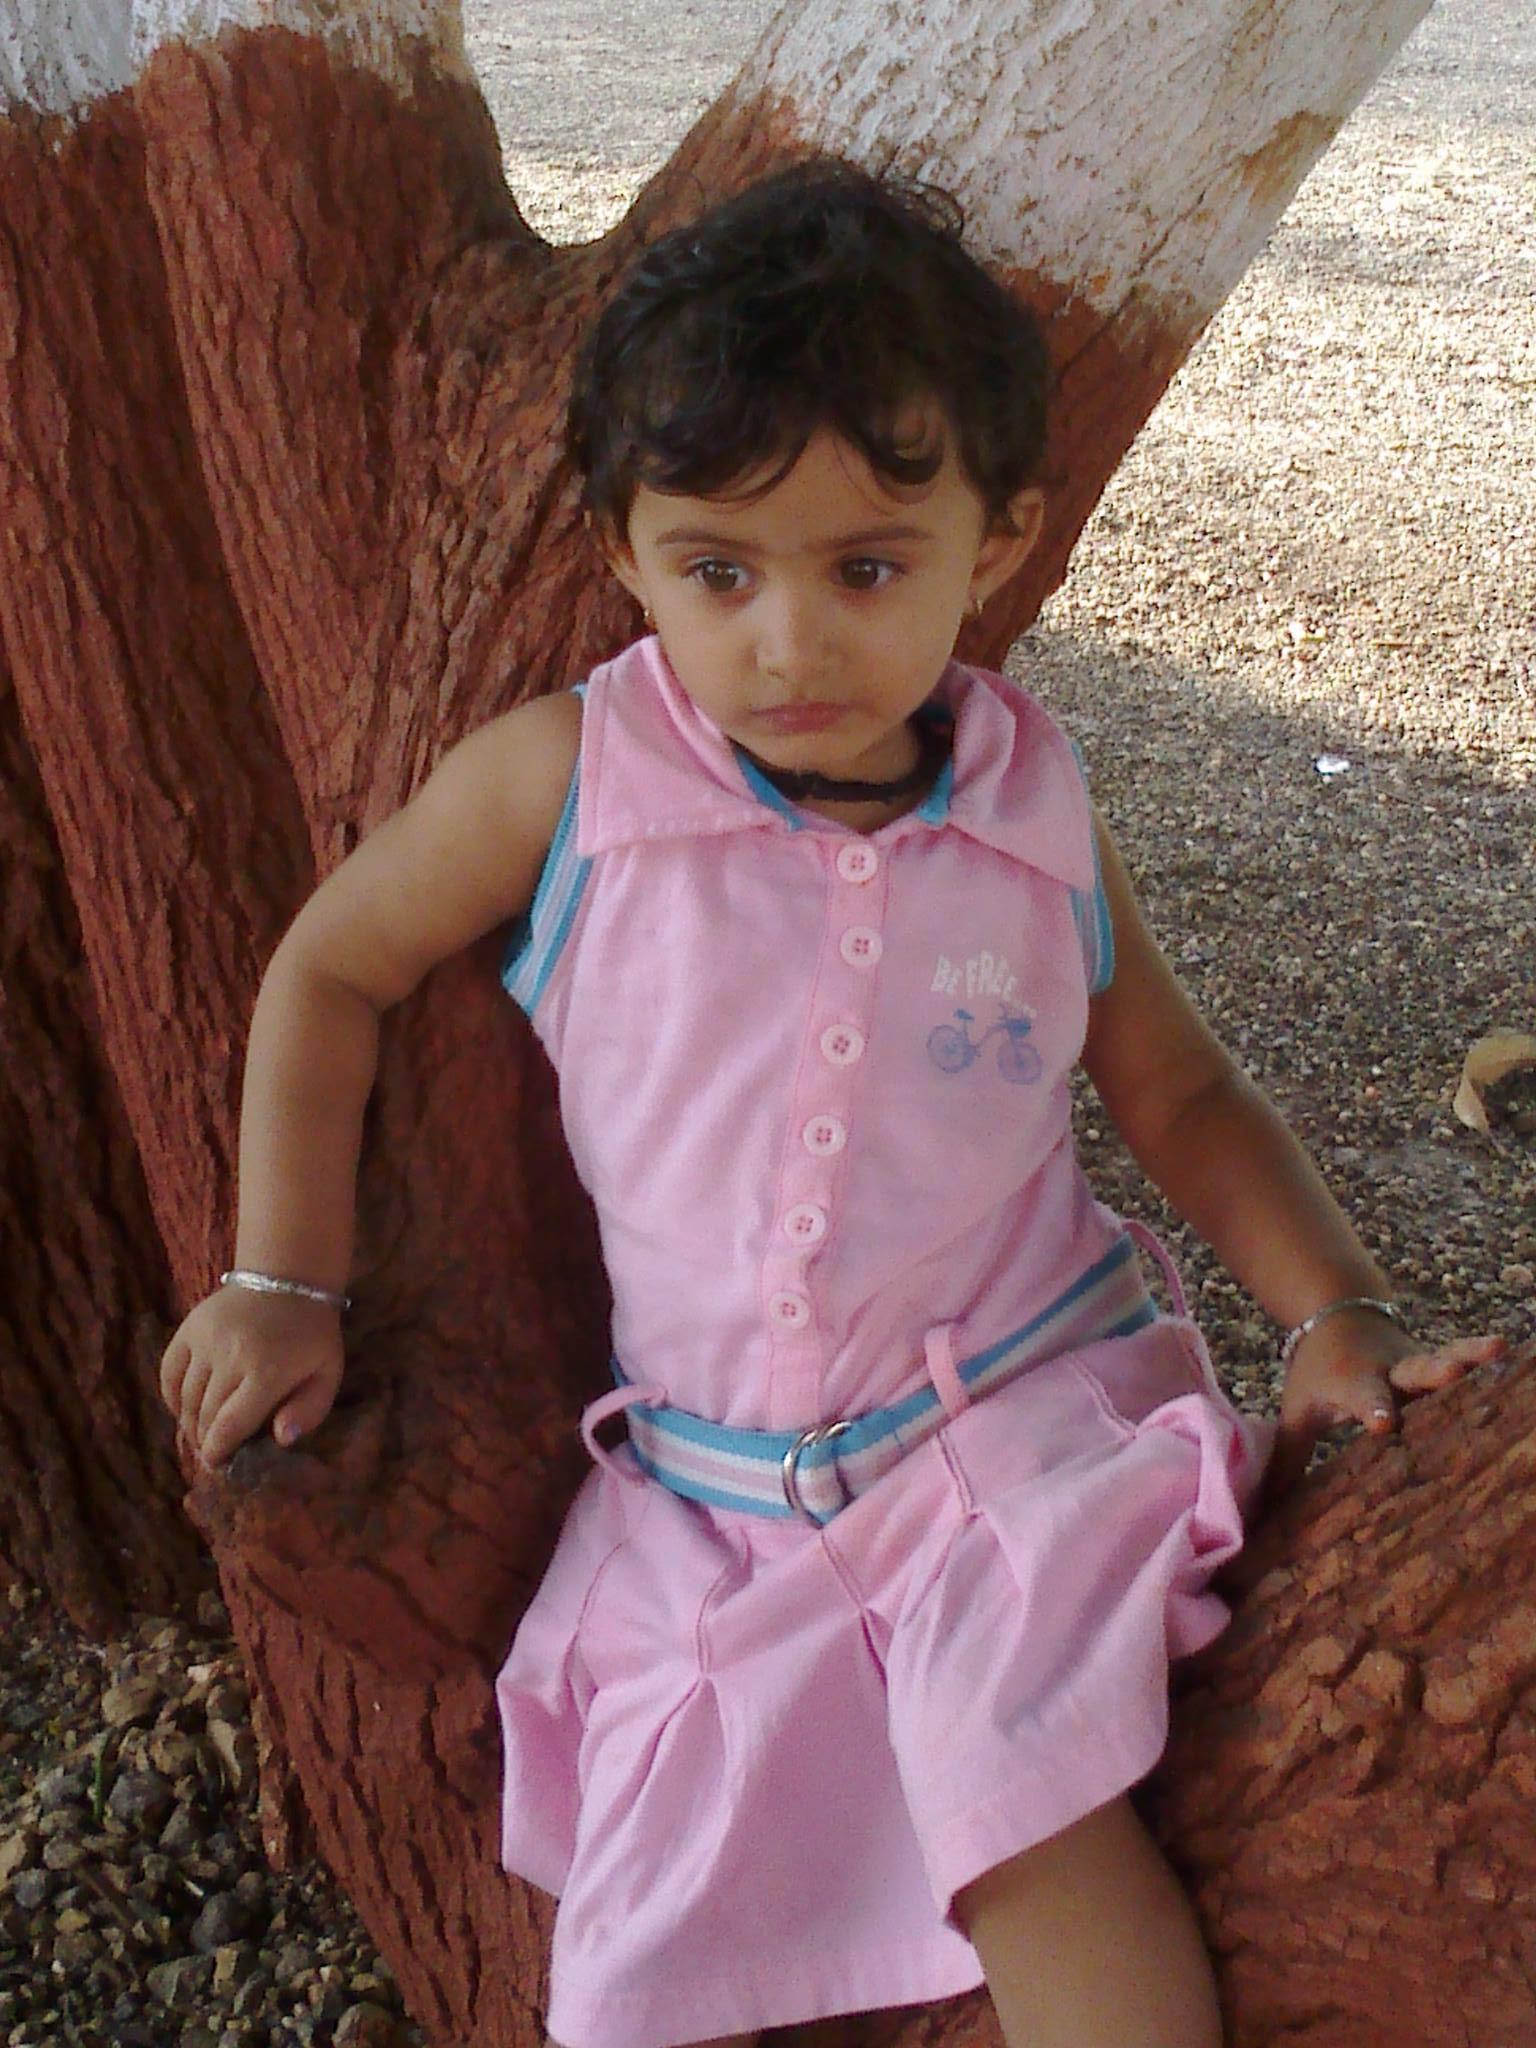 My Beautiful Doll Girl by Bharat75